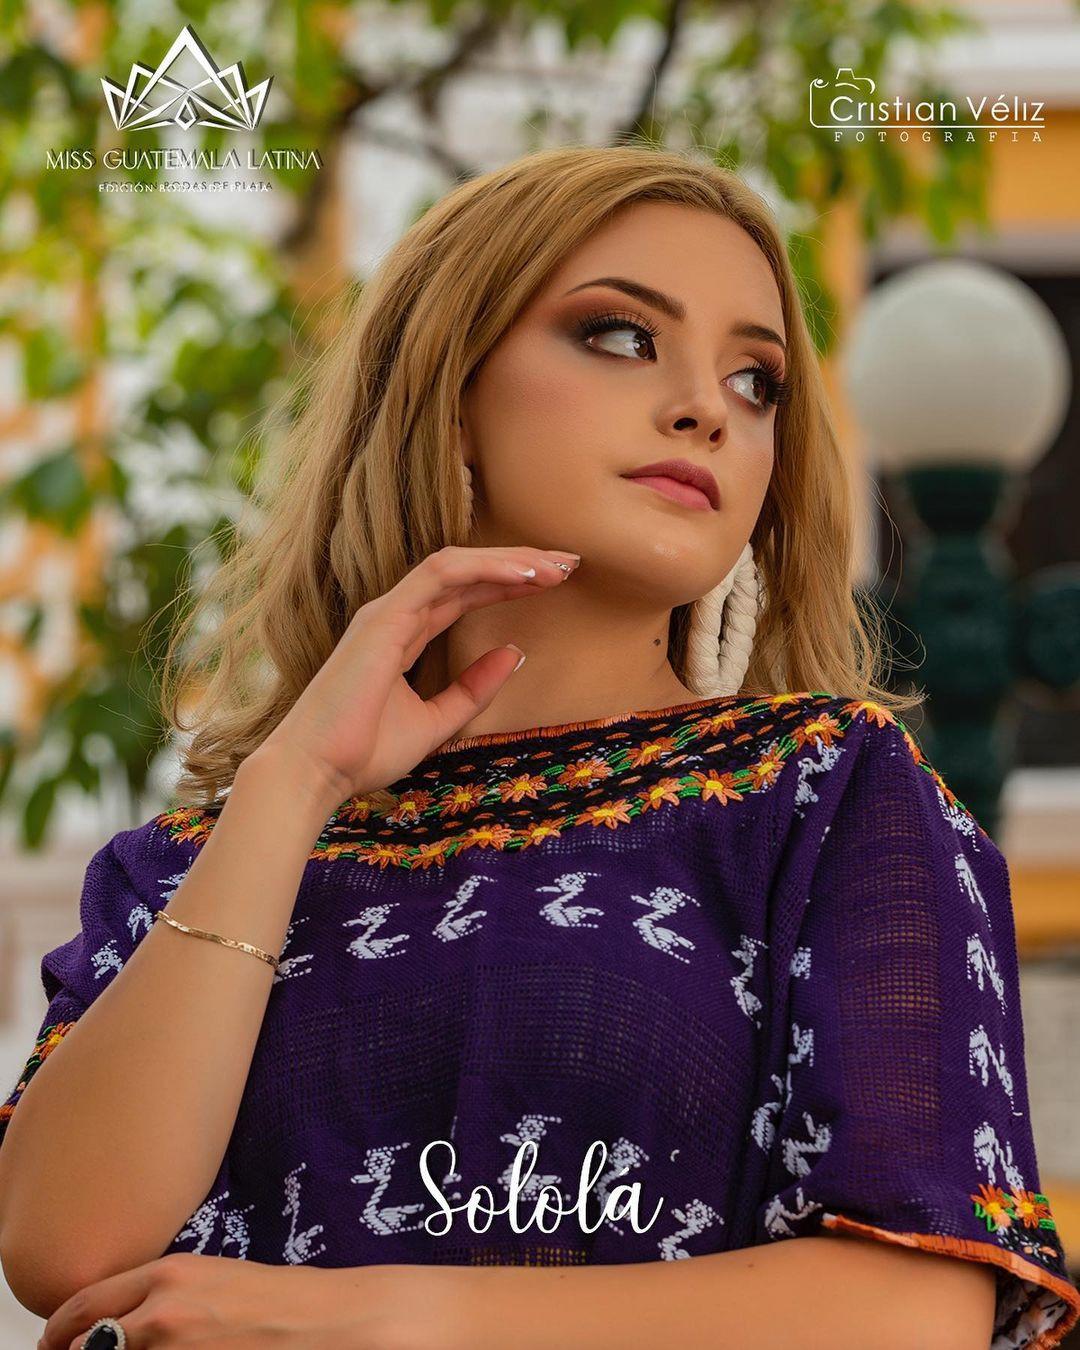 candidatas a miss guatemala latina 2021. final: 30 de abril. - Página 3 B2r3Cu